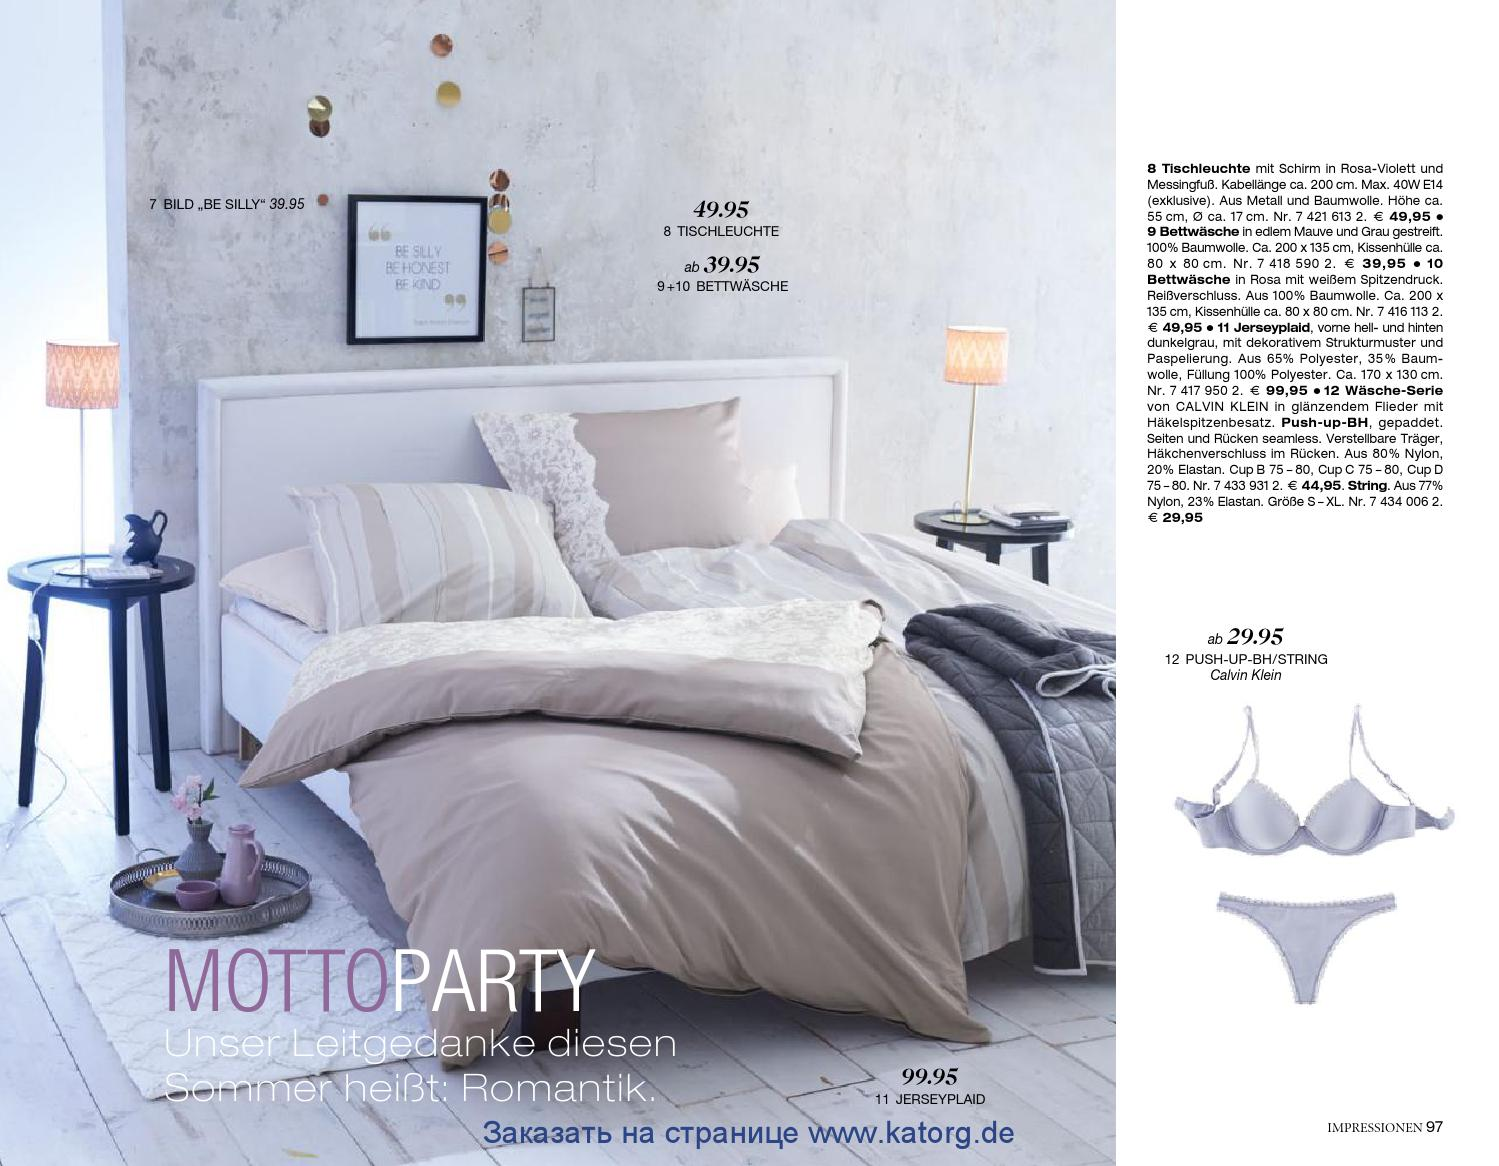 new product ed3cb 7d2e3 Impressionen für Körper und Seele by Katorg World of ...